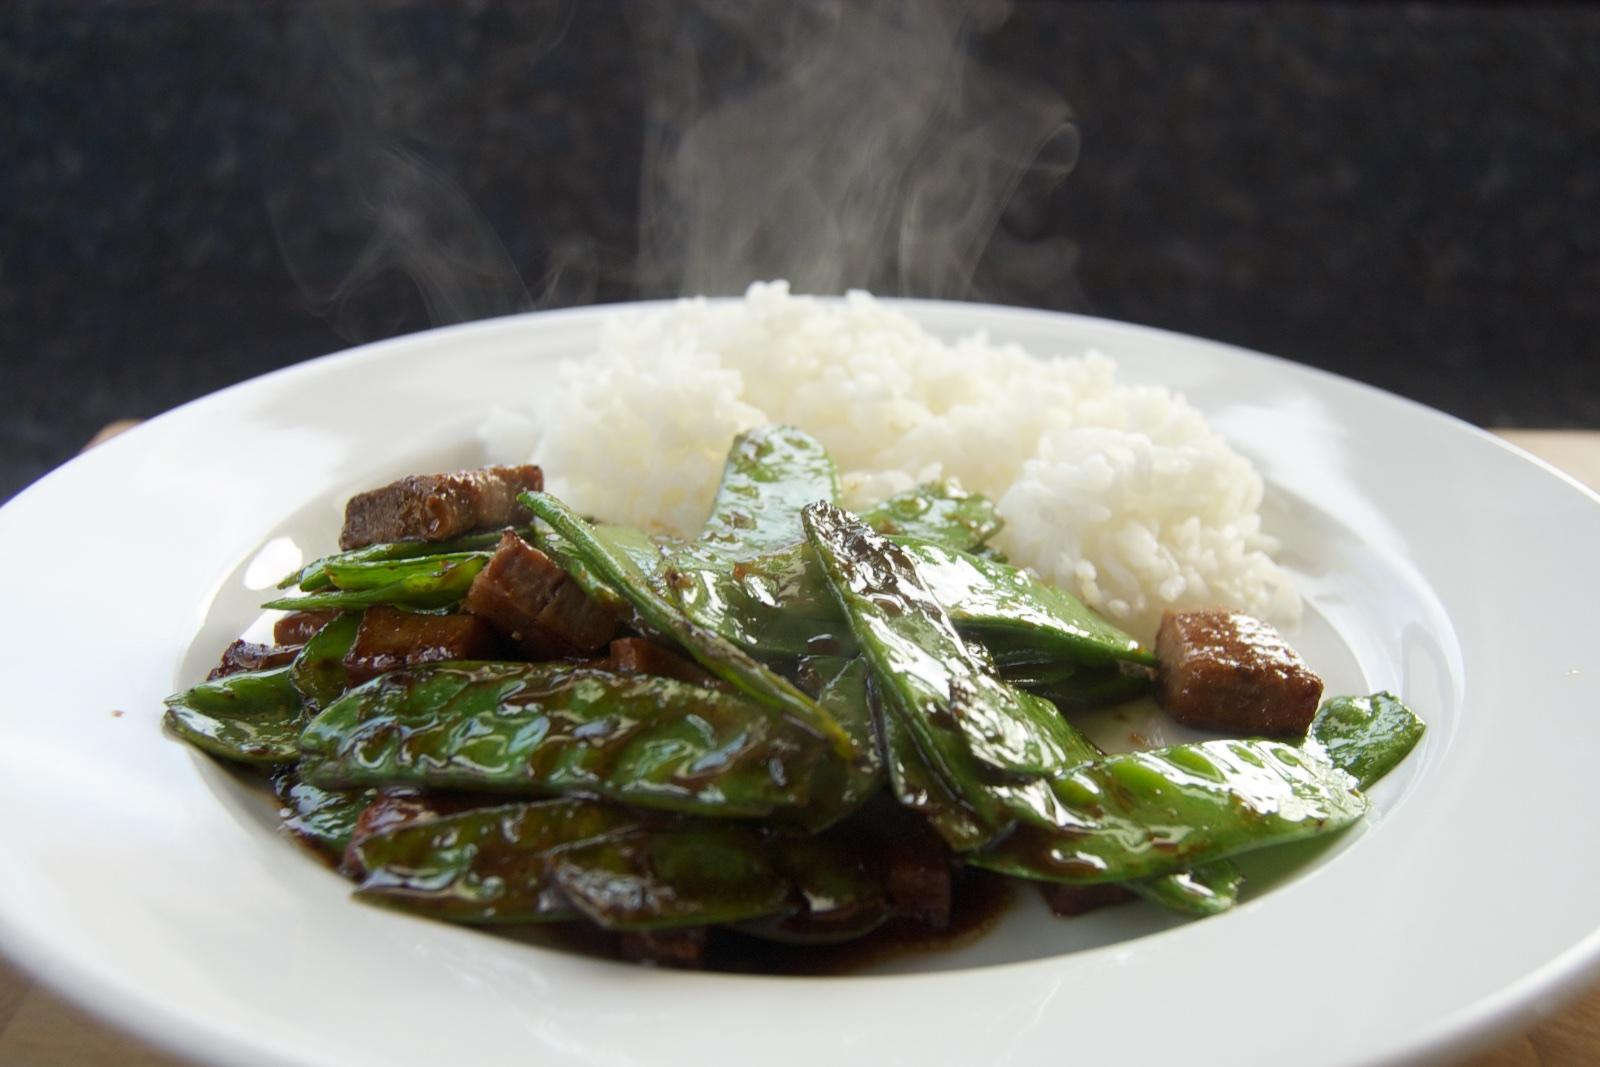 http://blog.rickk.com/food/2015/03/13/ate.2015.03.13.l.jpg